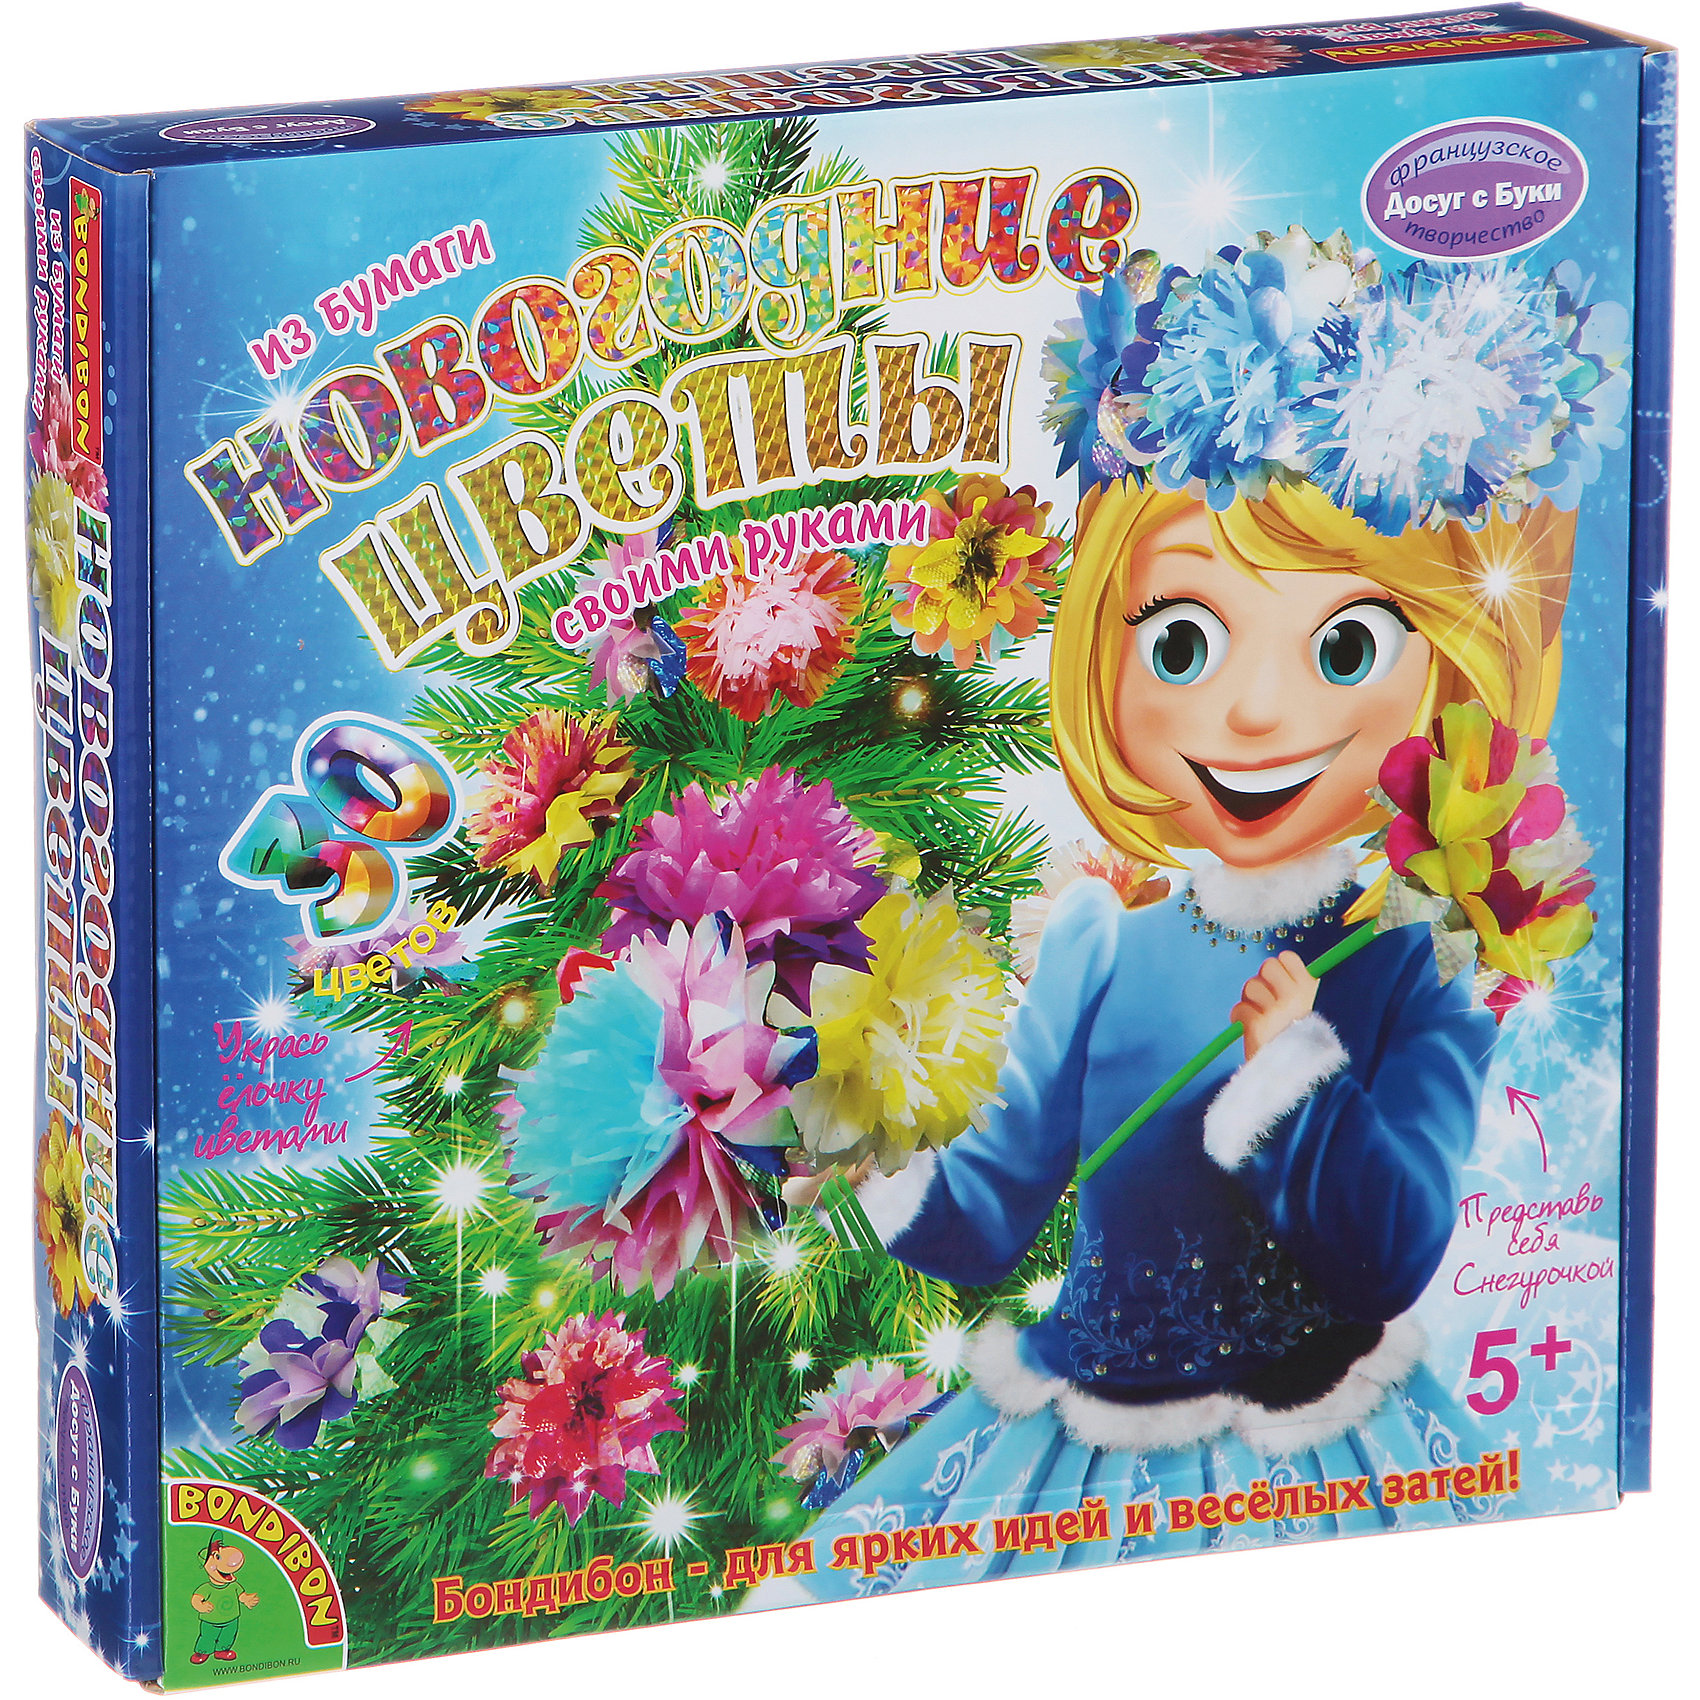 Bondibon Набор для творчества Новогодние цветы, Bondibon bondibon новогодние украшения